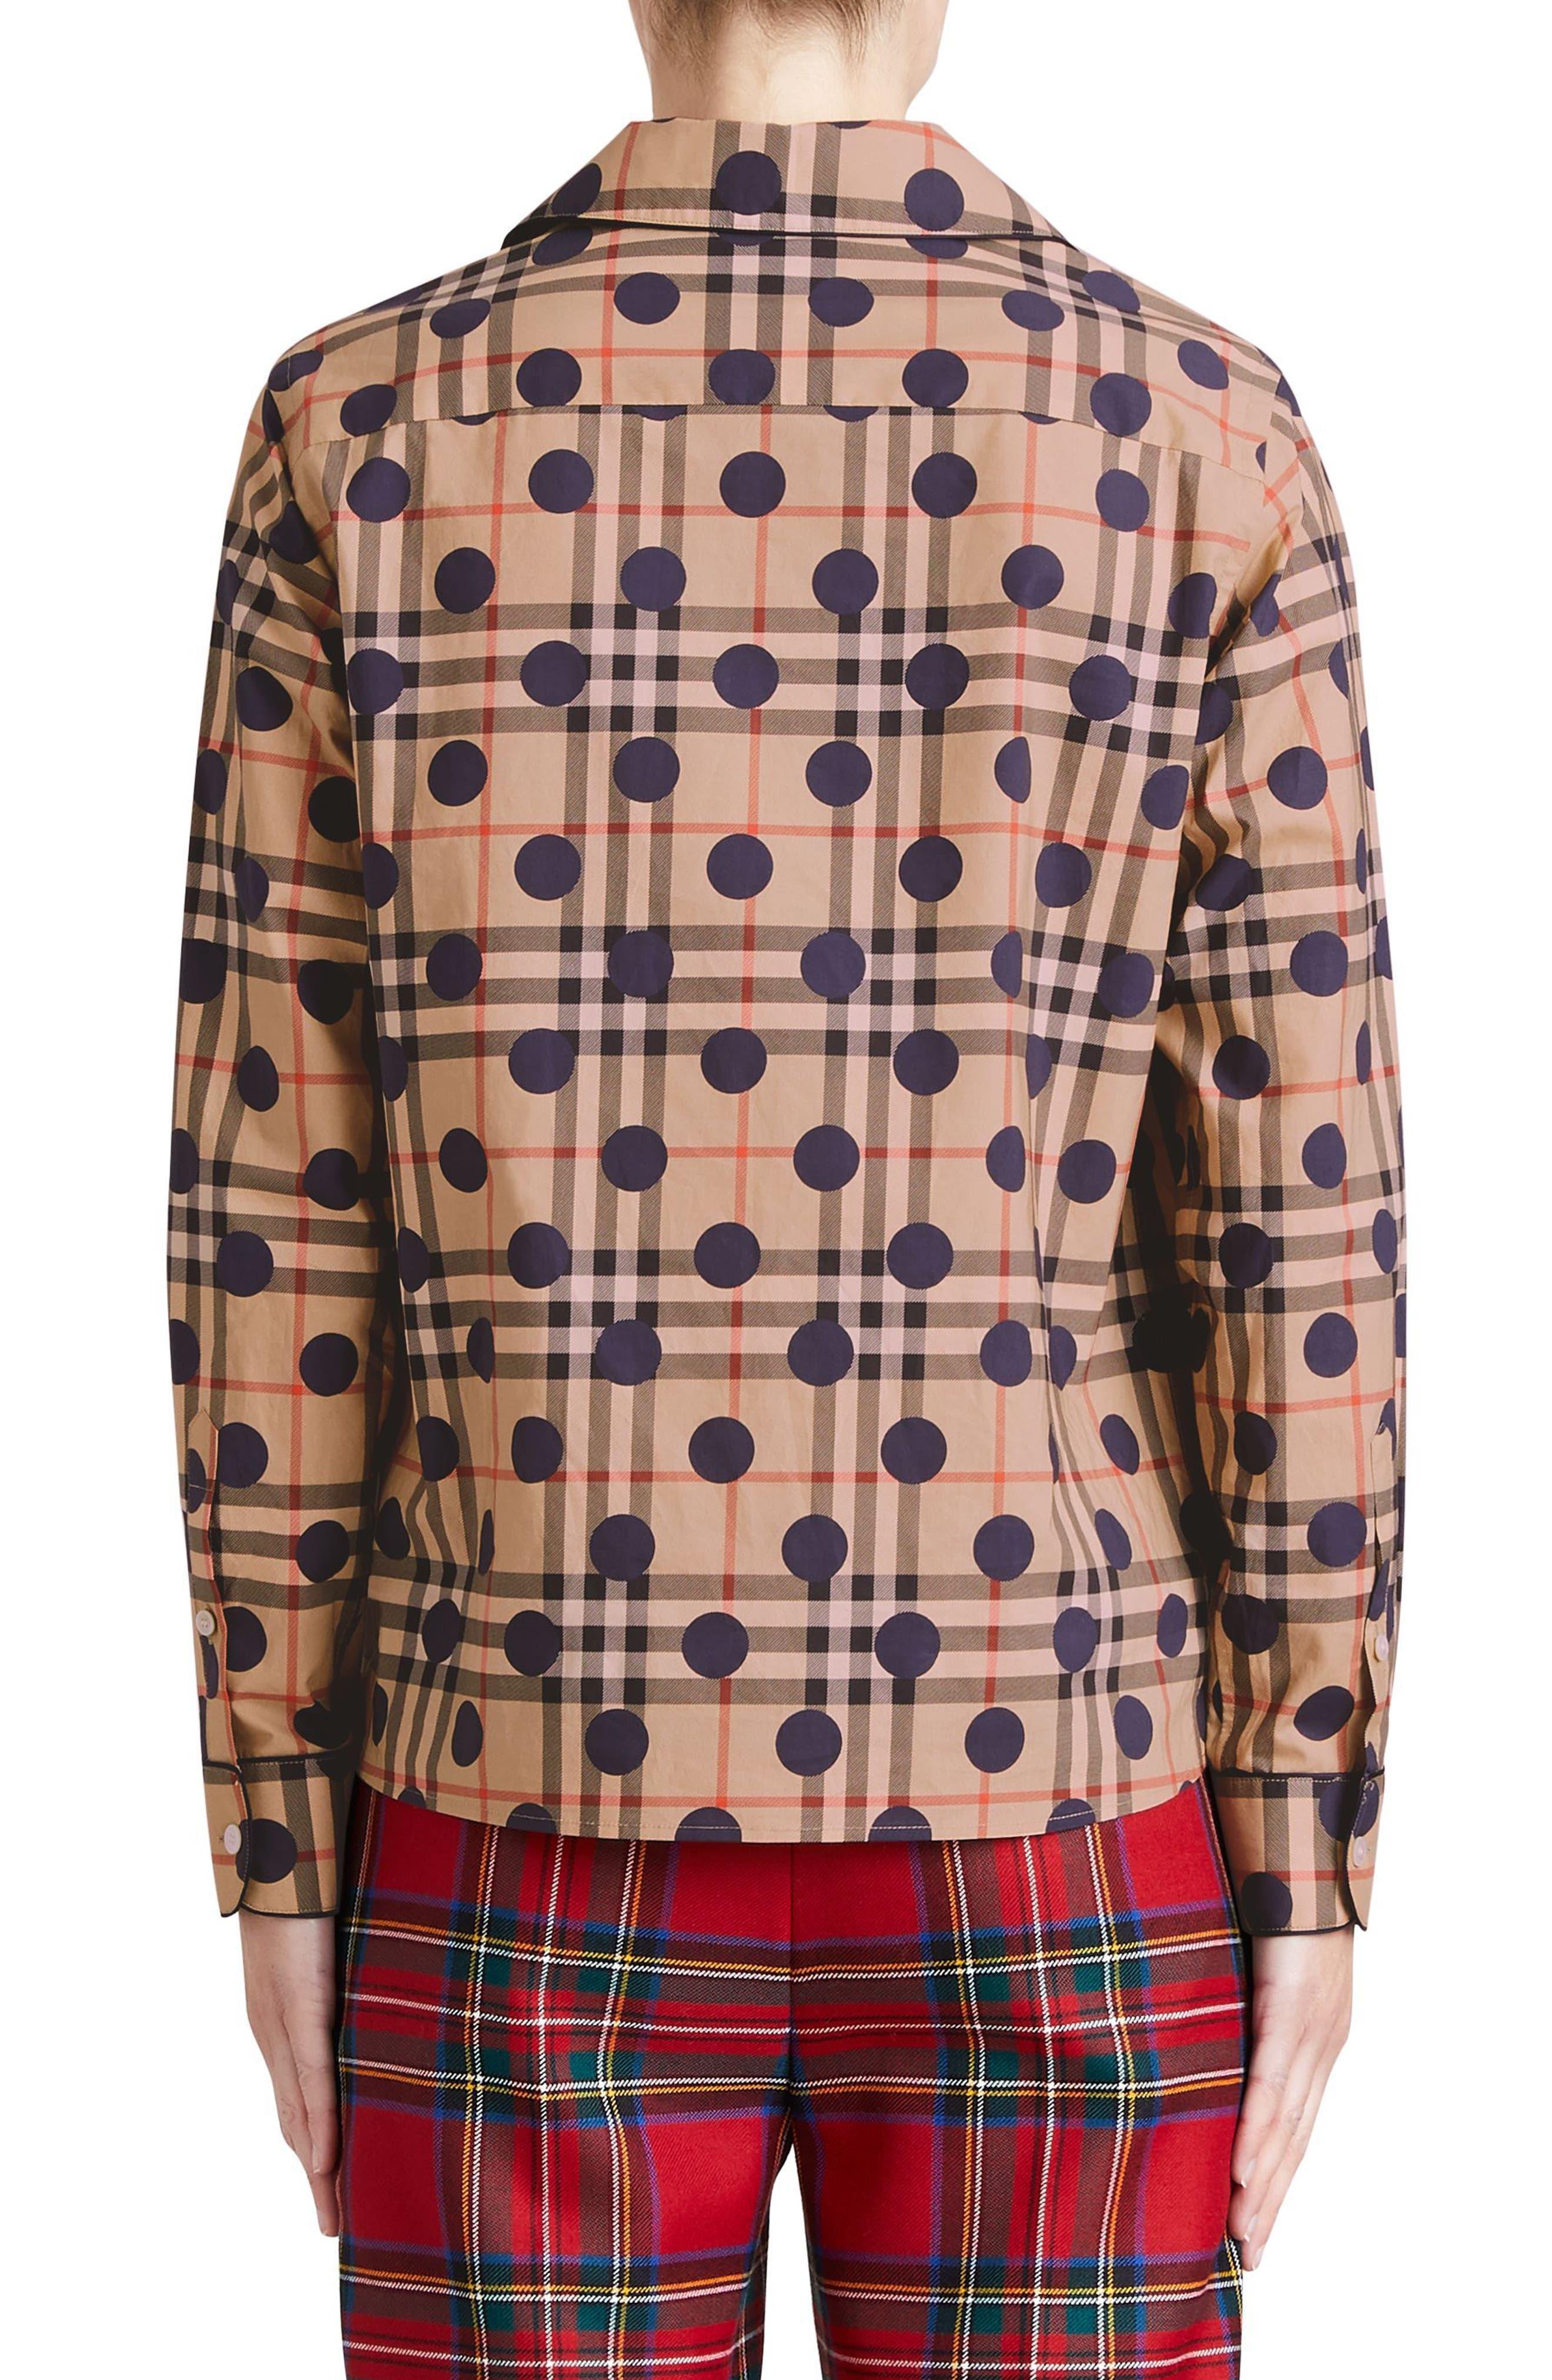 Polka Dot Check Print Cotton Shirt,                             Alternate thumbnail 2, color,                             Camel Multi